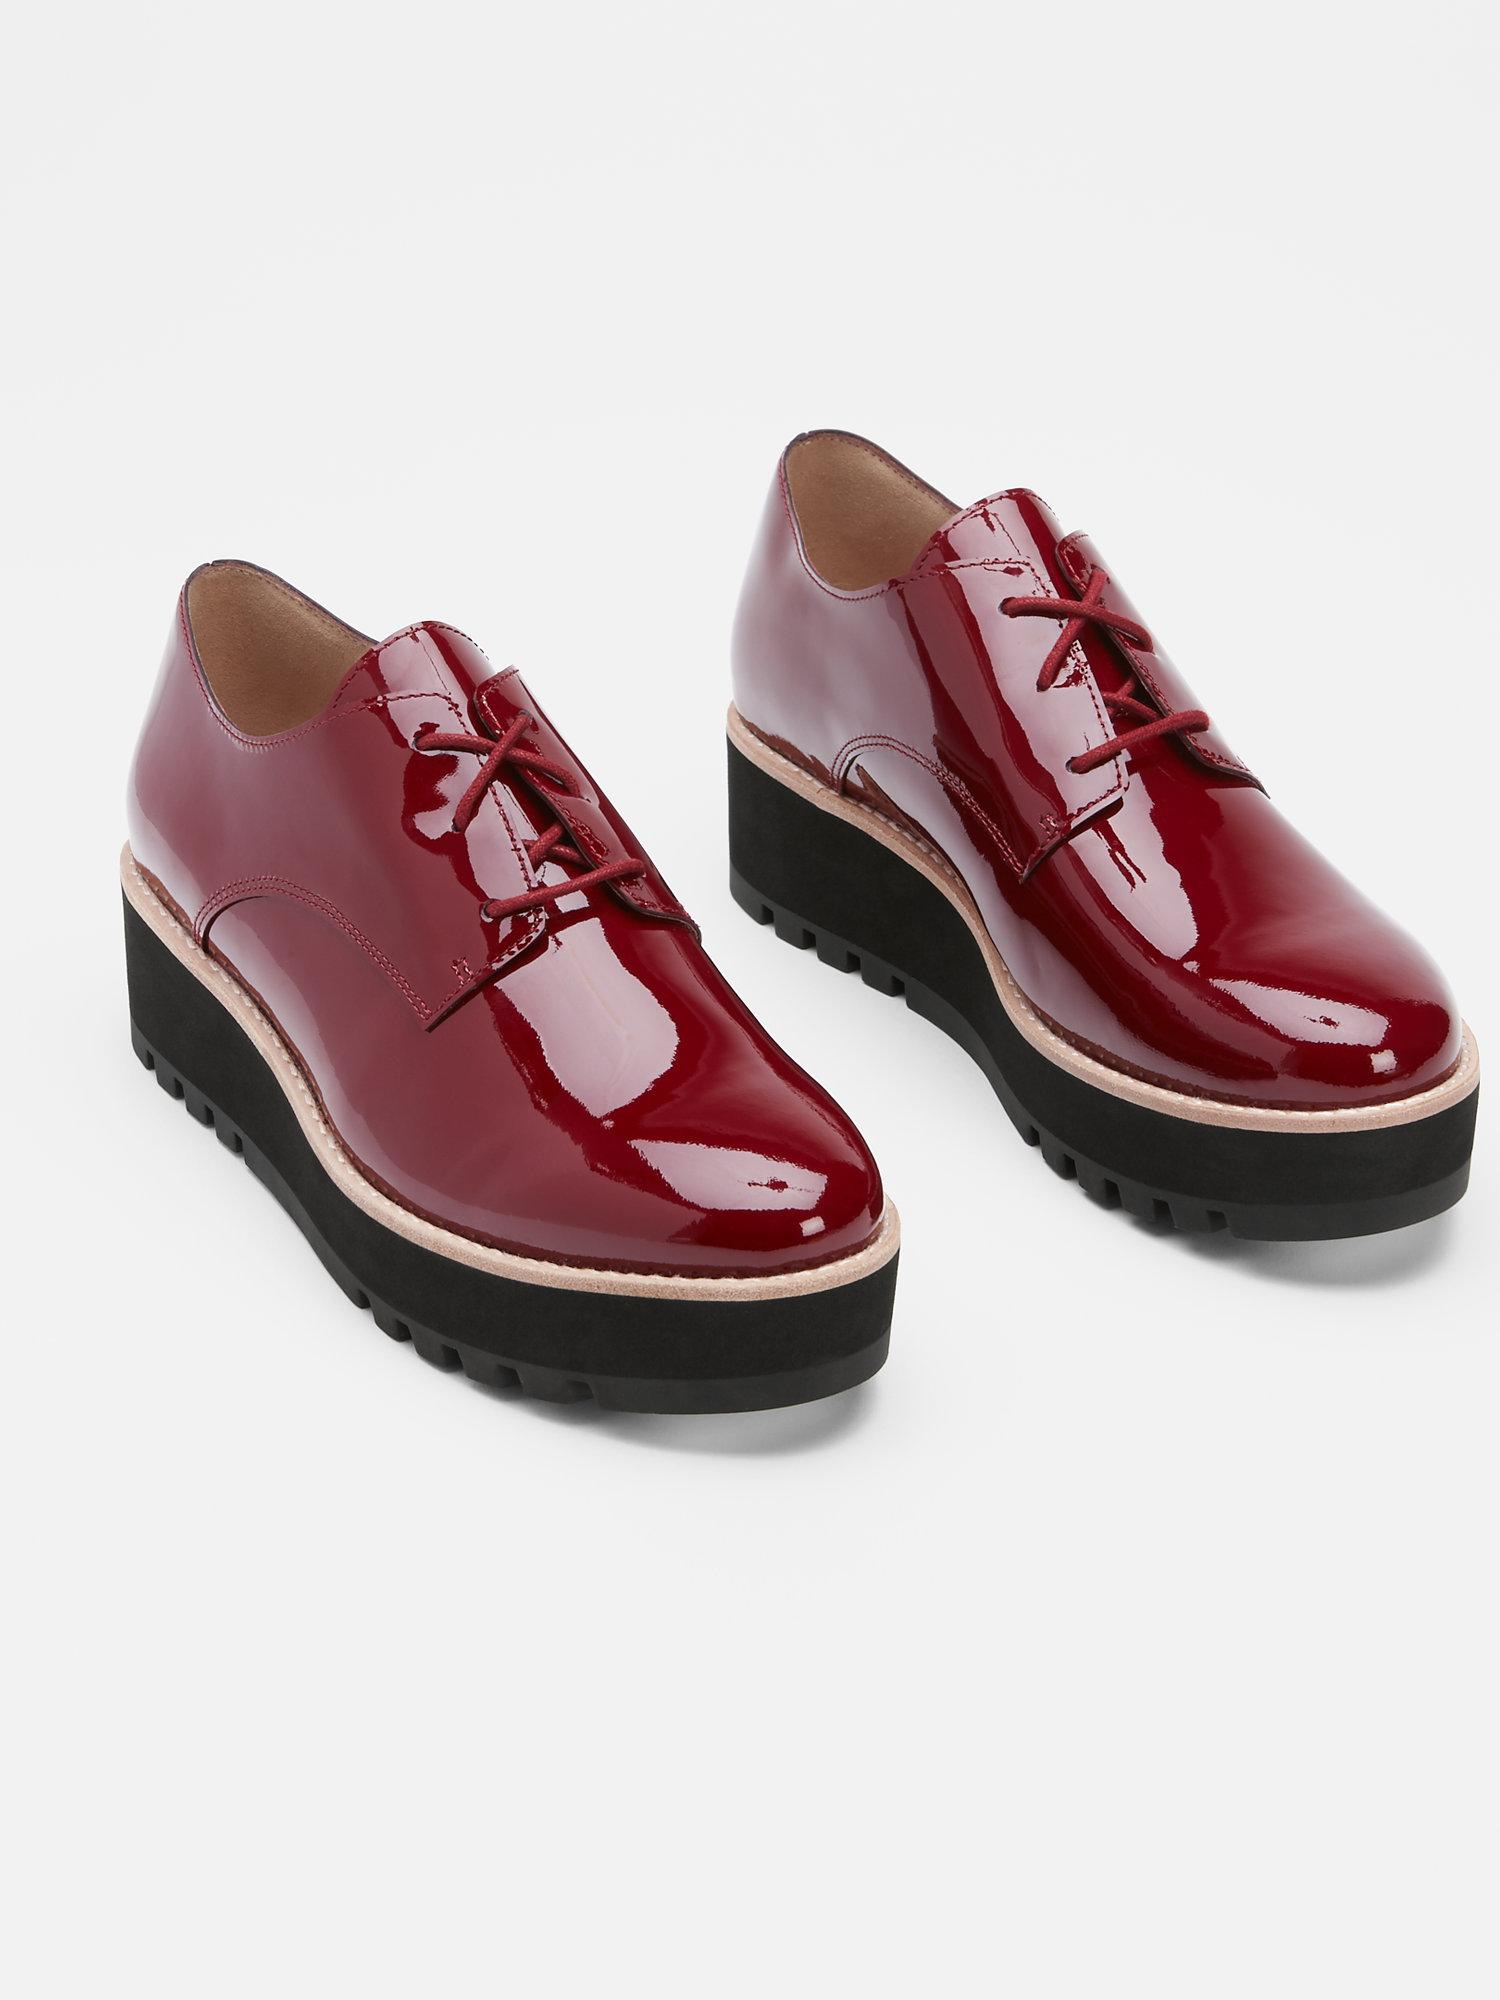 Eddy Patent Platform Oxford Shoes